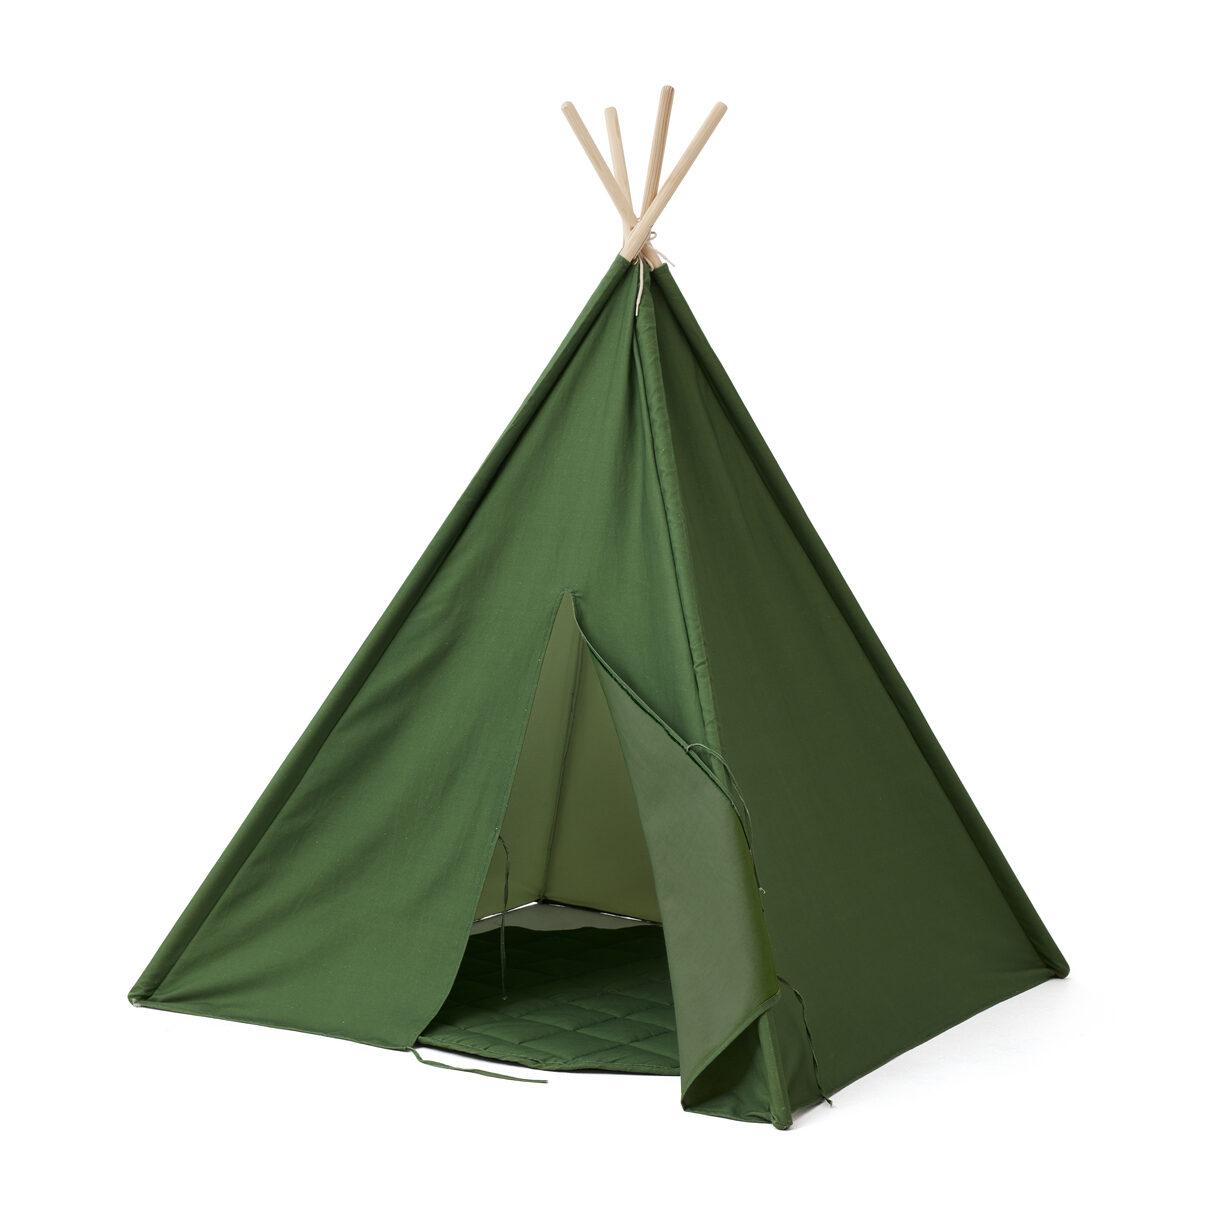 Kids Concept - Tipi Tent - Green (1000477)